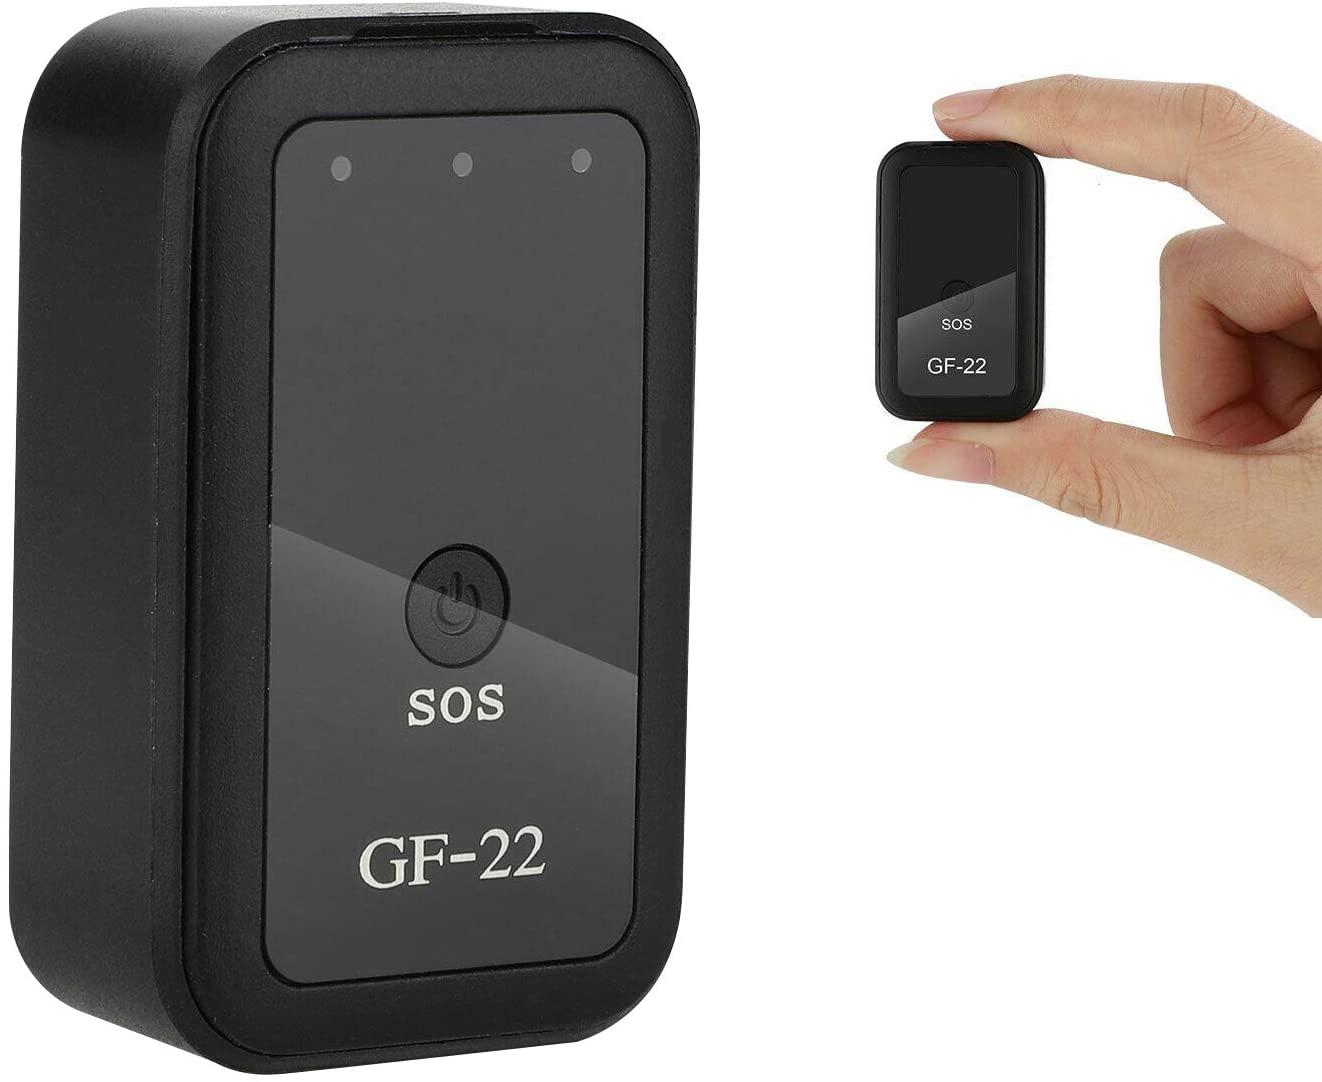 GF-22 لتحديد المواقع المقتفي في الوقت الحقيقي محدد GSM واي فاي جهاز تعقب حماية السياج المغناطيسي لمكافحة خسر جهاز تعقب للأطفال سيارة